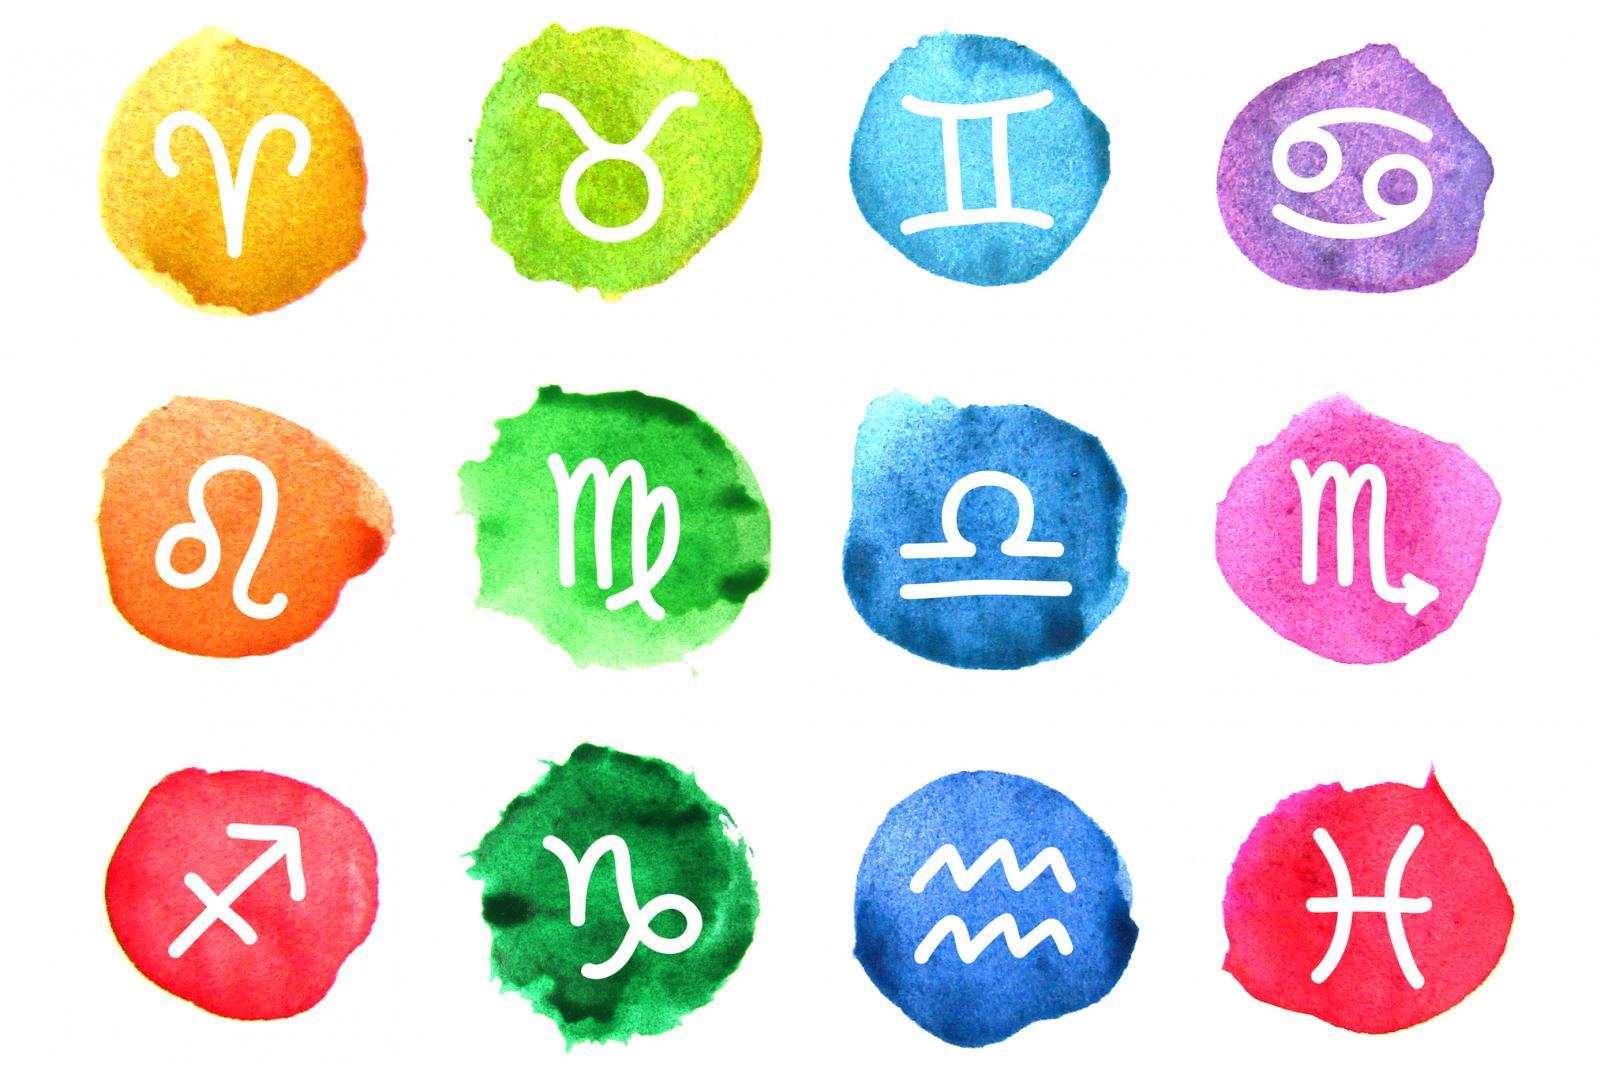 233742-1600x1066-zodiac-signs